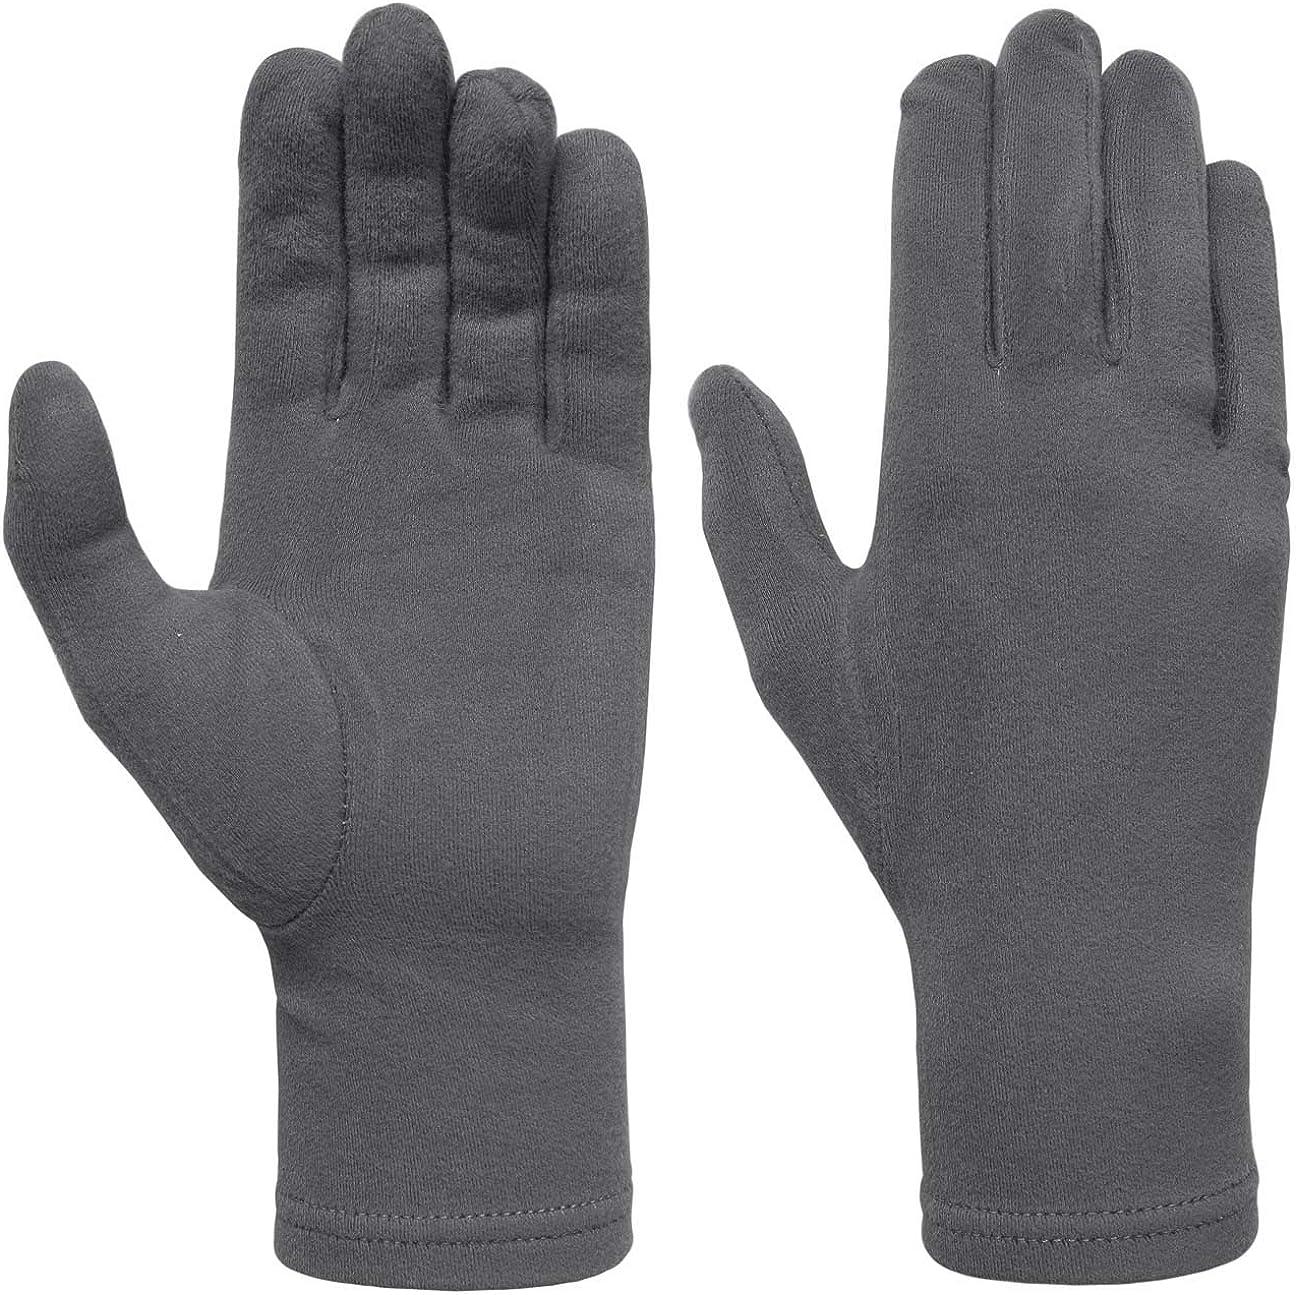 Hutshopping Damen Microfleece Handschuhe Damenhandschuhe Fleecehandschuhe Sporthandschuhe